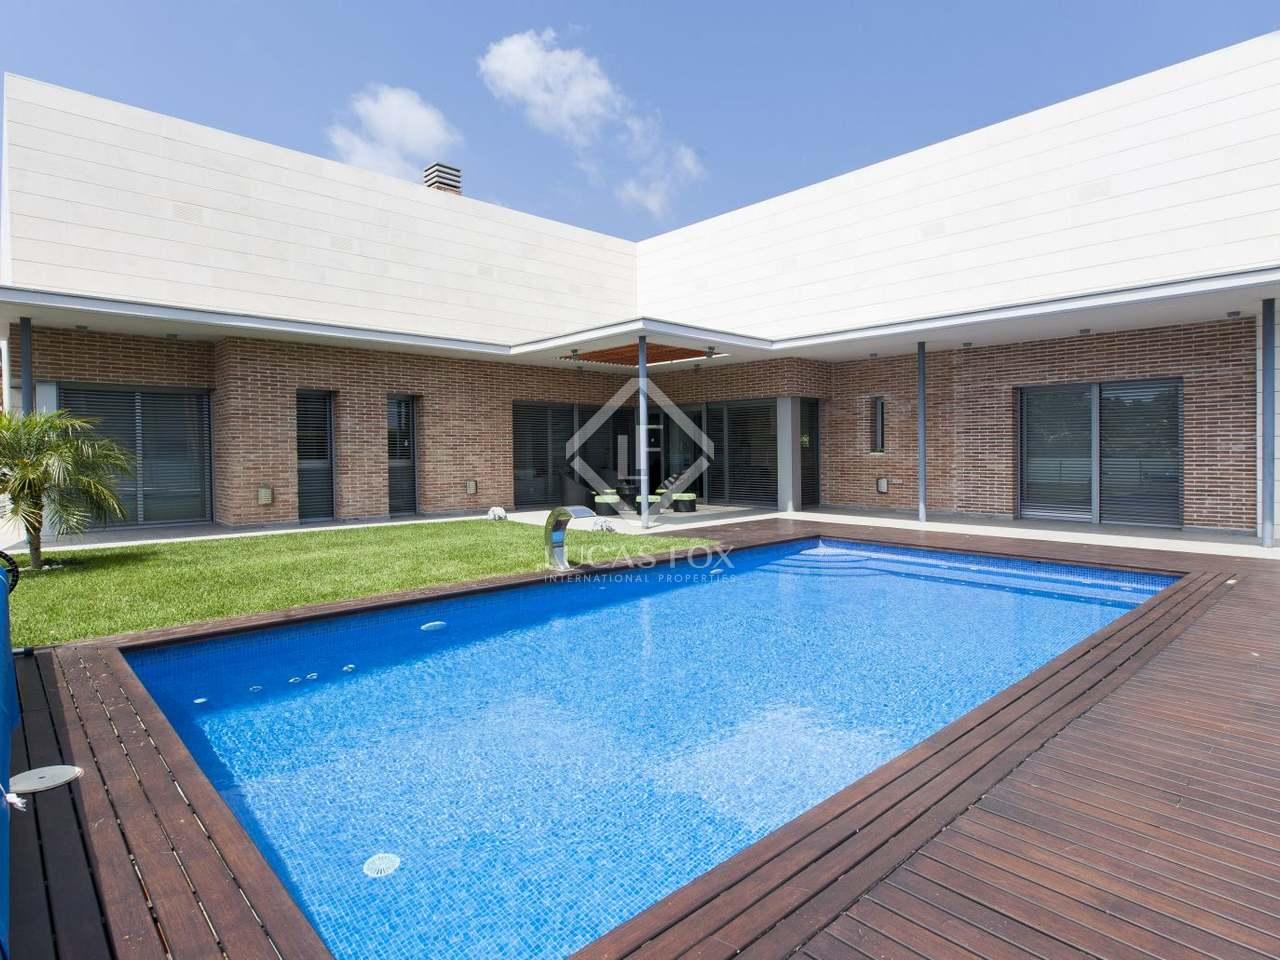 Villa con jard n y piscina en venta en castelldefels for Piscina castelldefels